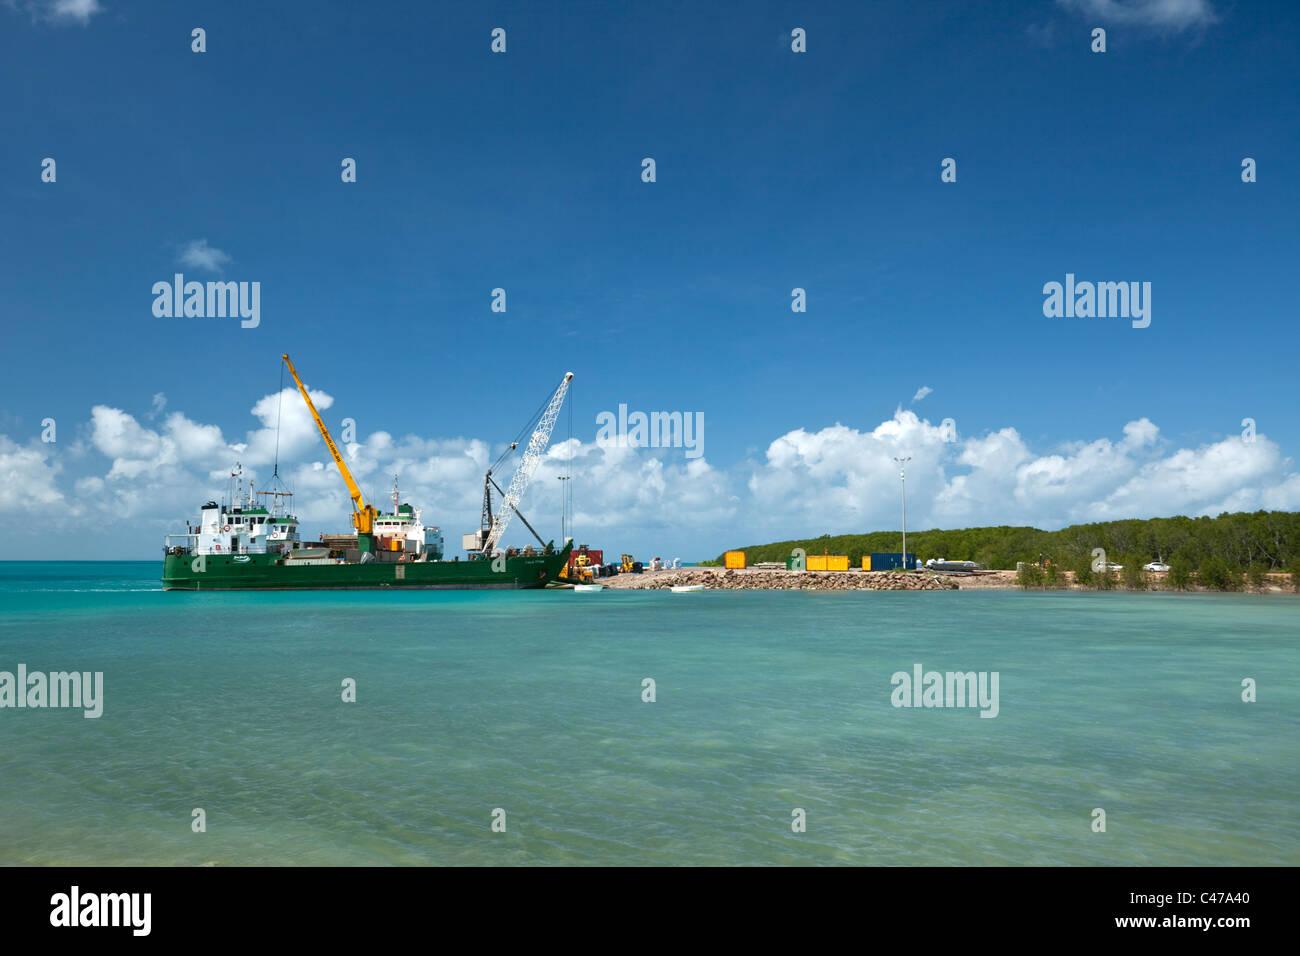 A cargo ship unloads cargo at the port. Horn Island, Torres Strait Islands, Queensland, Australia - Stock Image